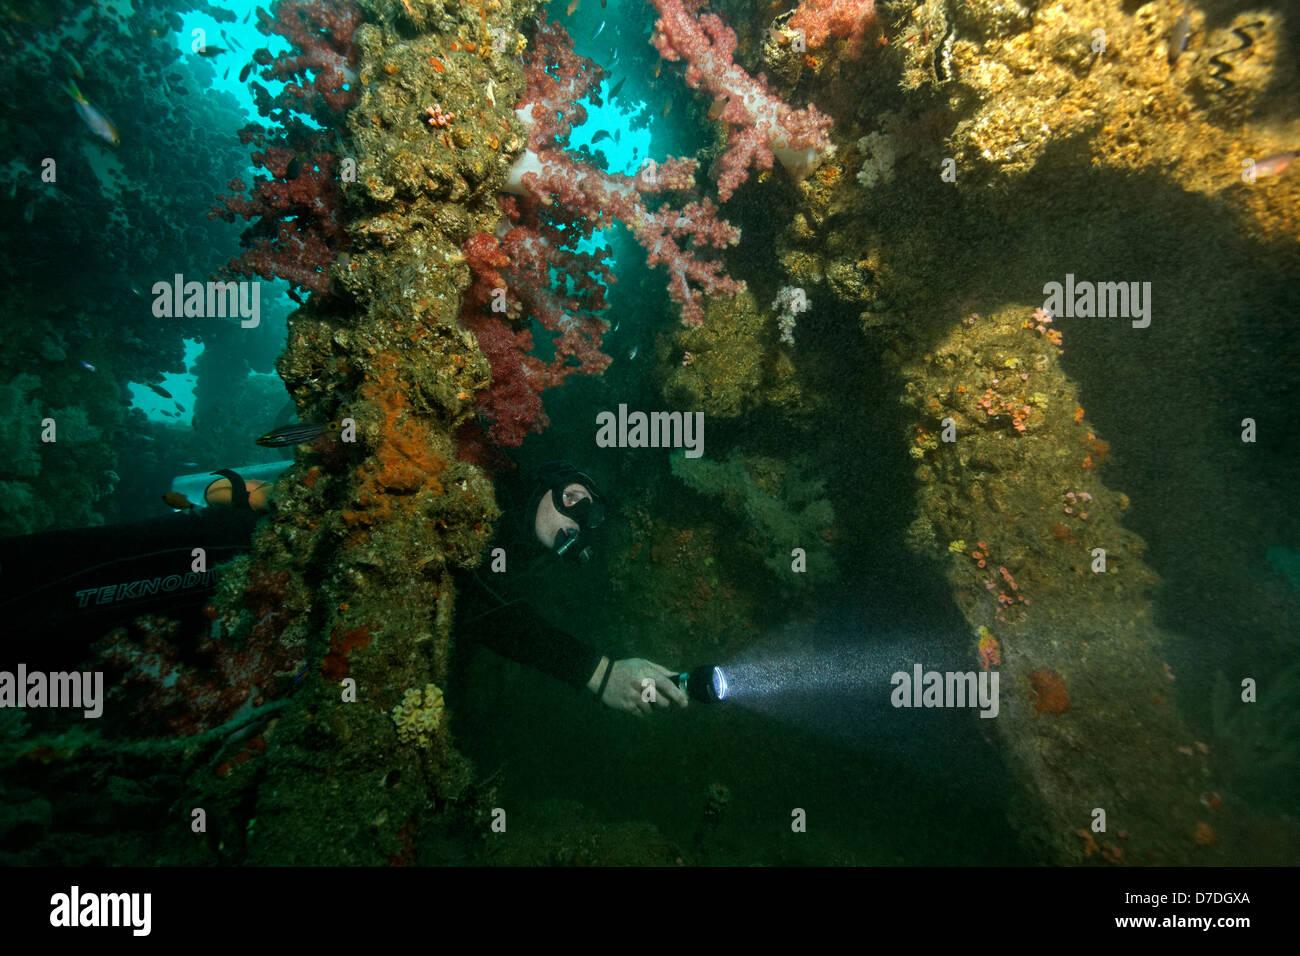 Scuba Diver at Wreck City of Winchester, Hallaniyat Islands, Arabian Sea, Oman Stock Photo